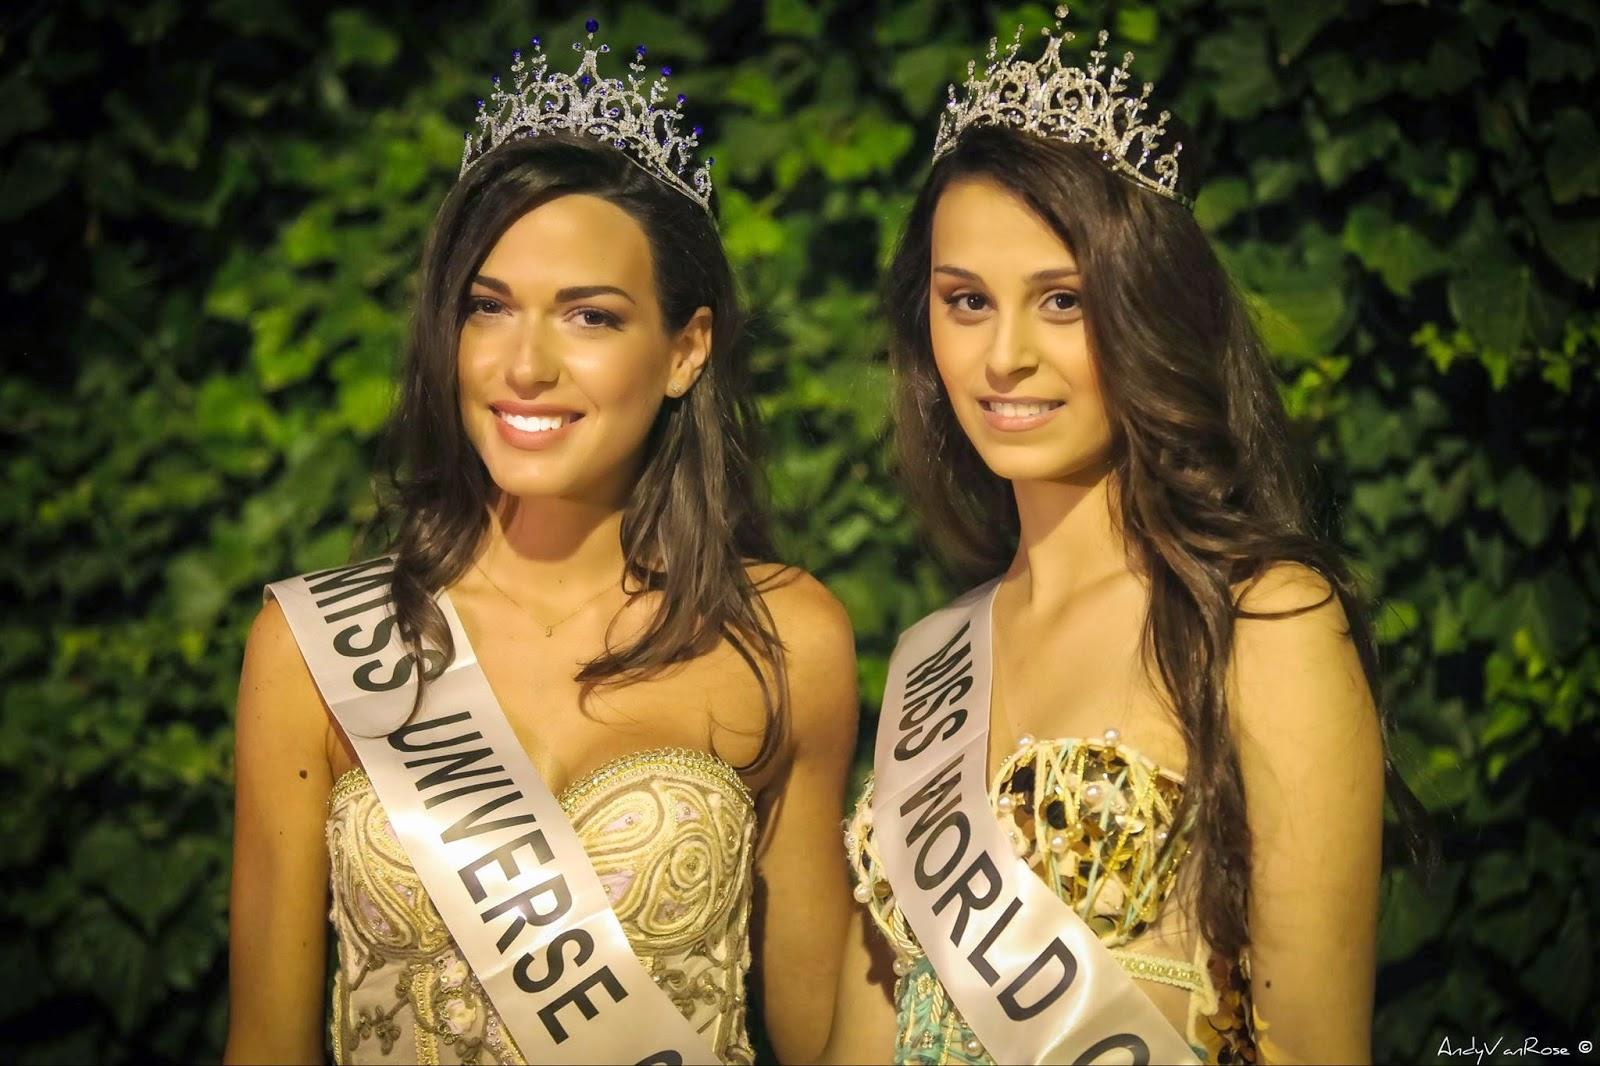 Miss Universe Greece 2014 Ismini Dafopoulou